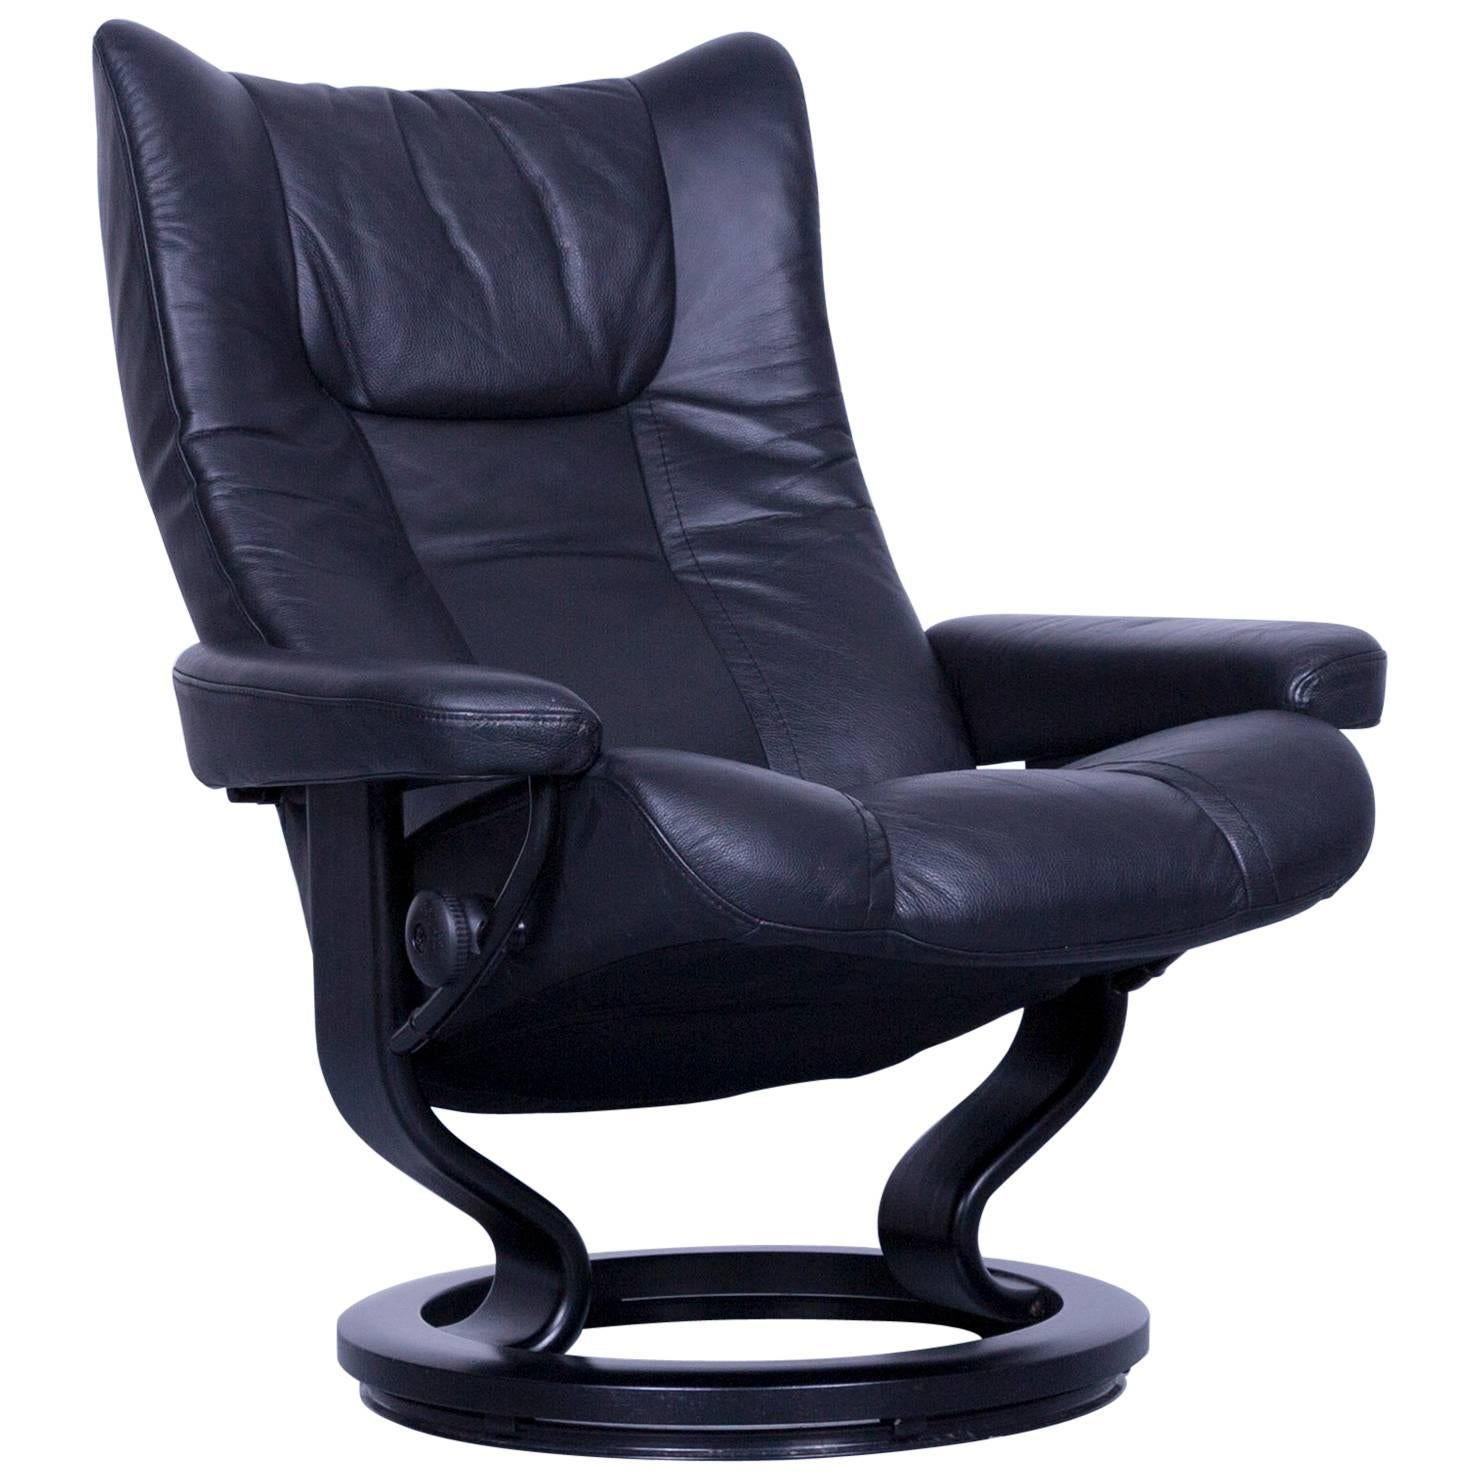 Ekornes Stressless Wing Armchair Black Leather Modern Recliner Chair  Designer For Sale